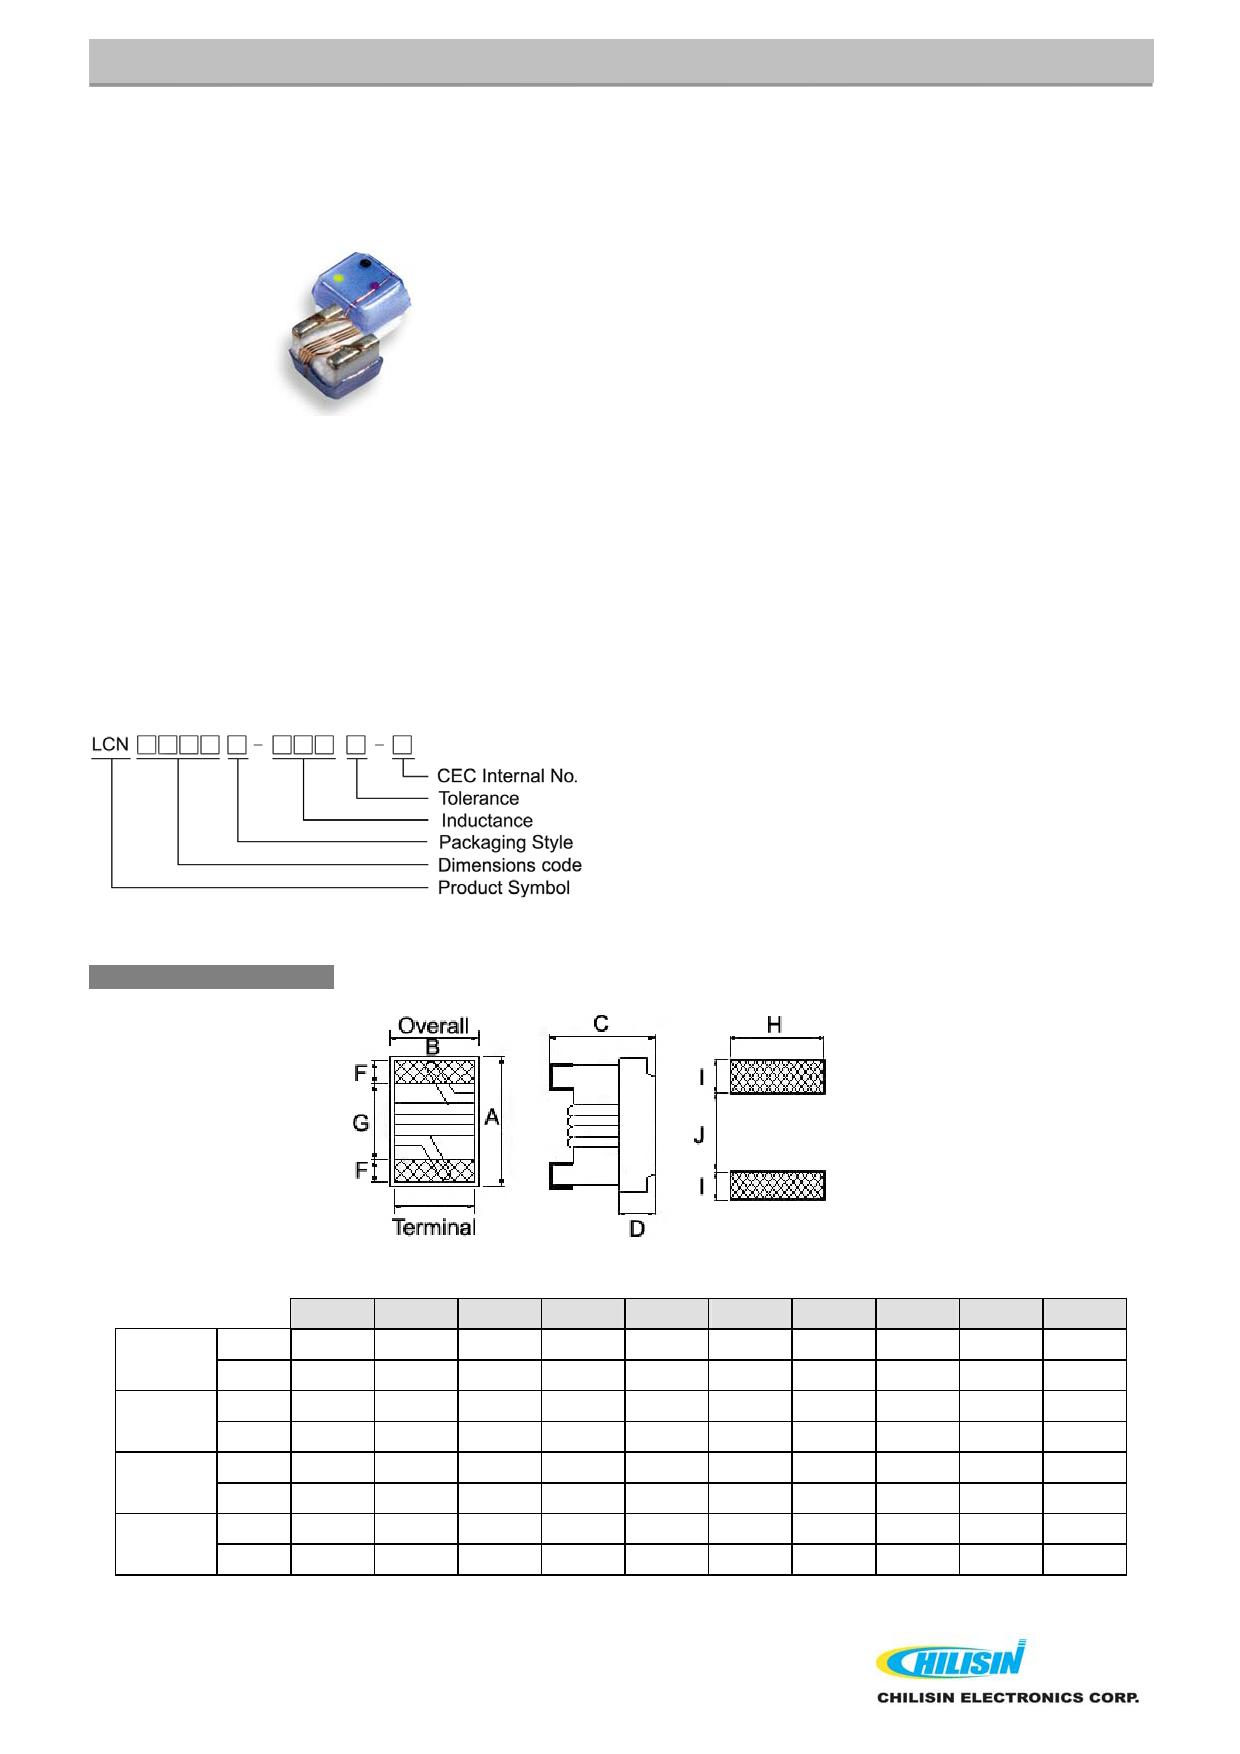 LCN1206T 데이터시트 및 LCN1206T PDF